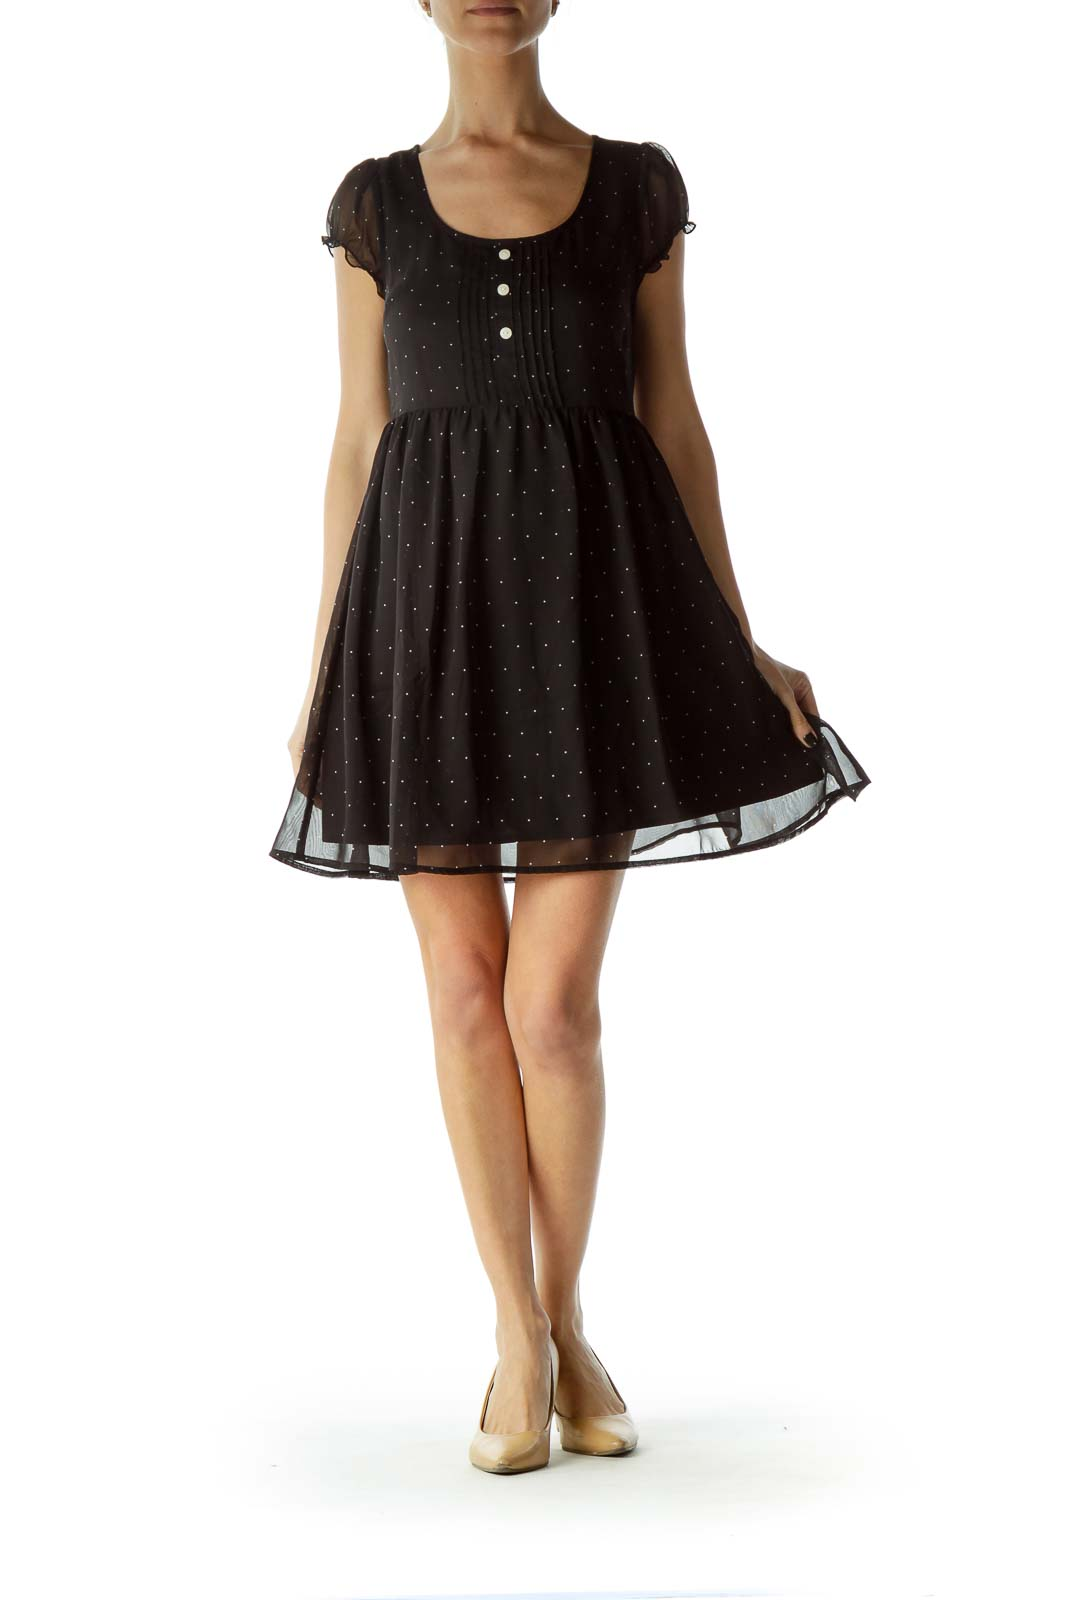 Black White Polka-Dot Day Dress